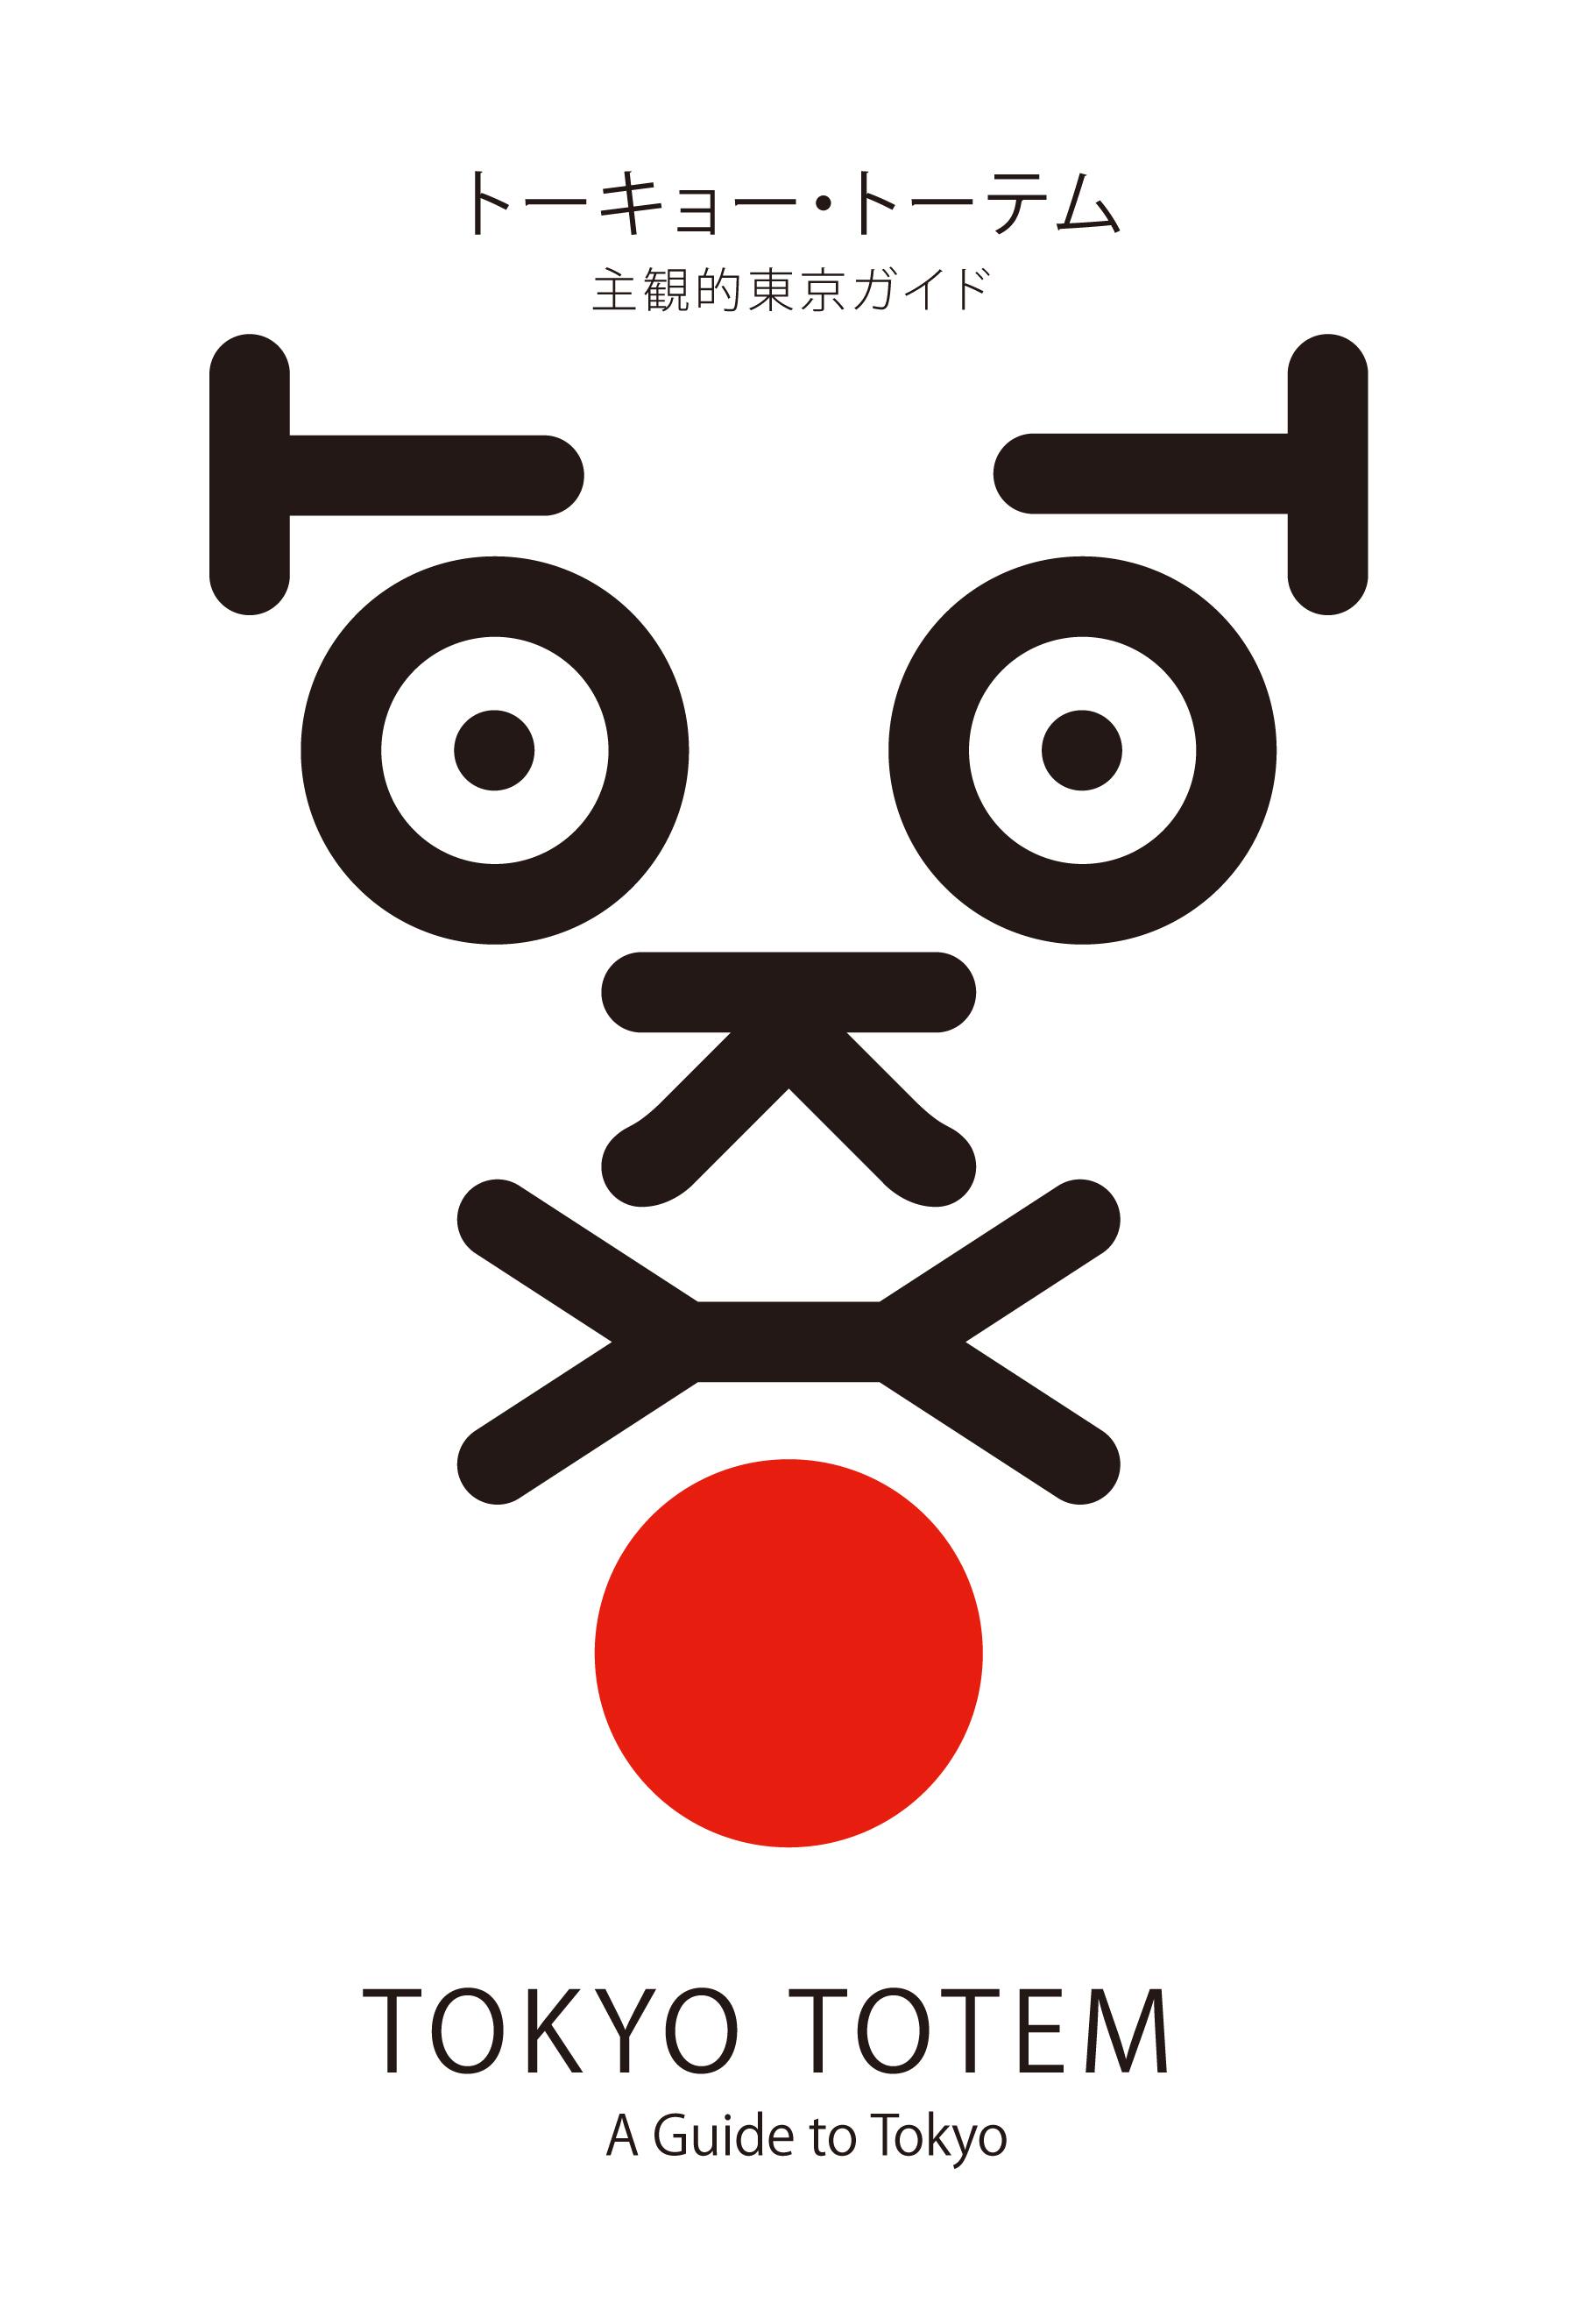 Afbeeldingsresultaat voor tokyo totem single ladies